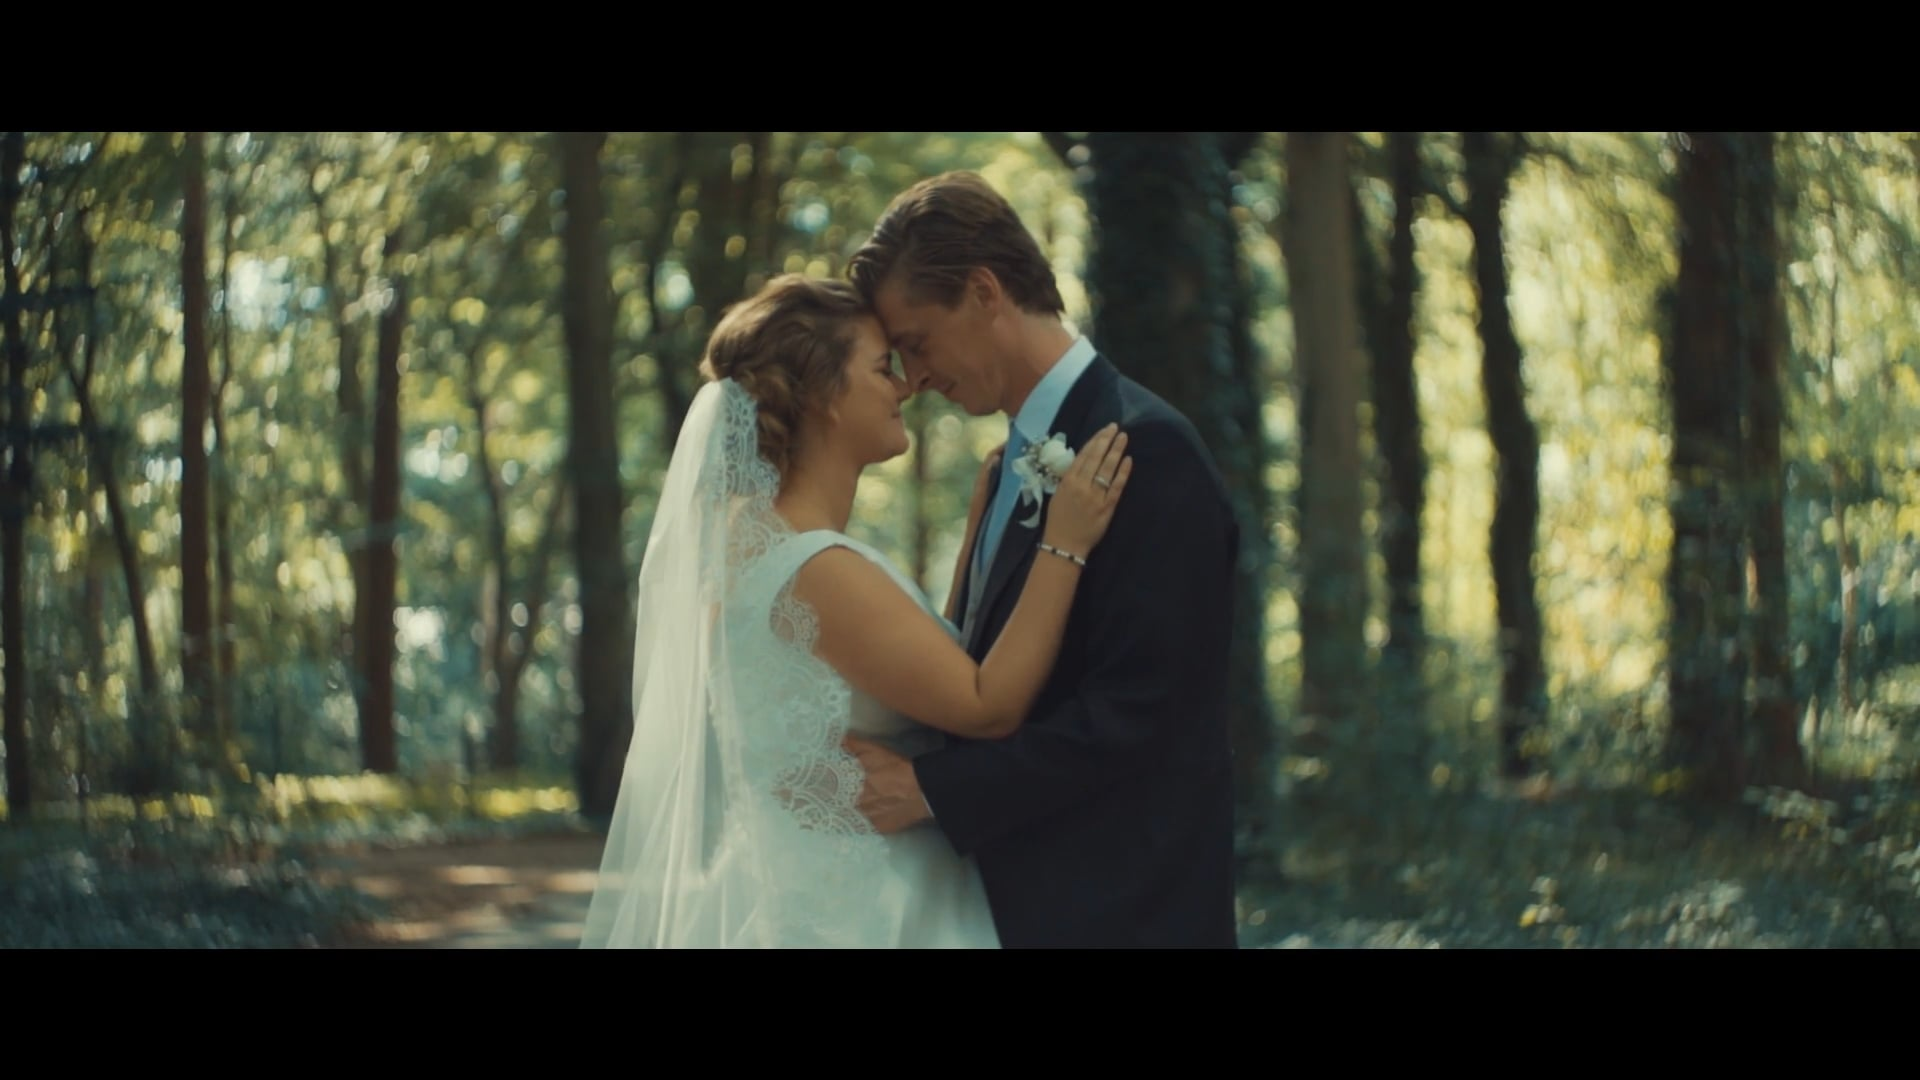 LISELOTTE & JEROEN - FULL FILM